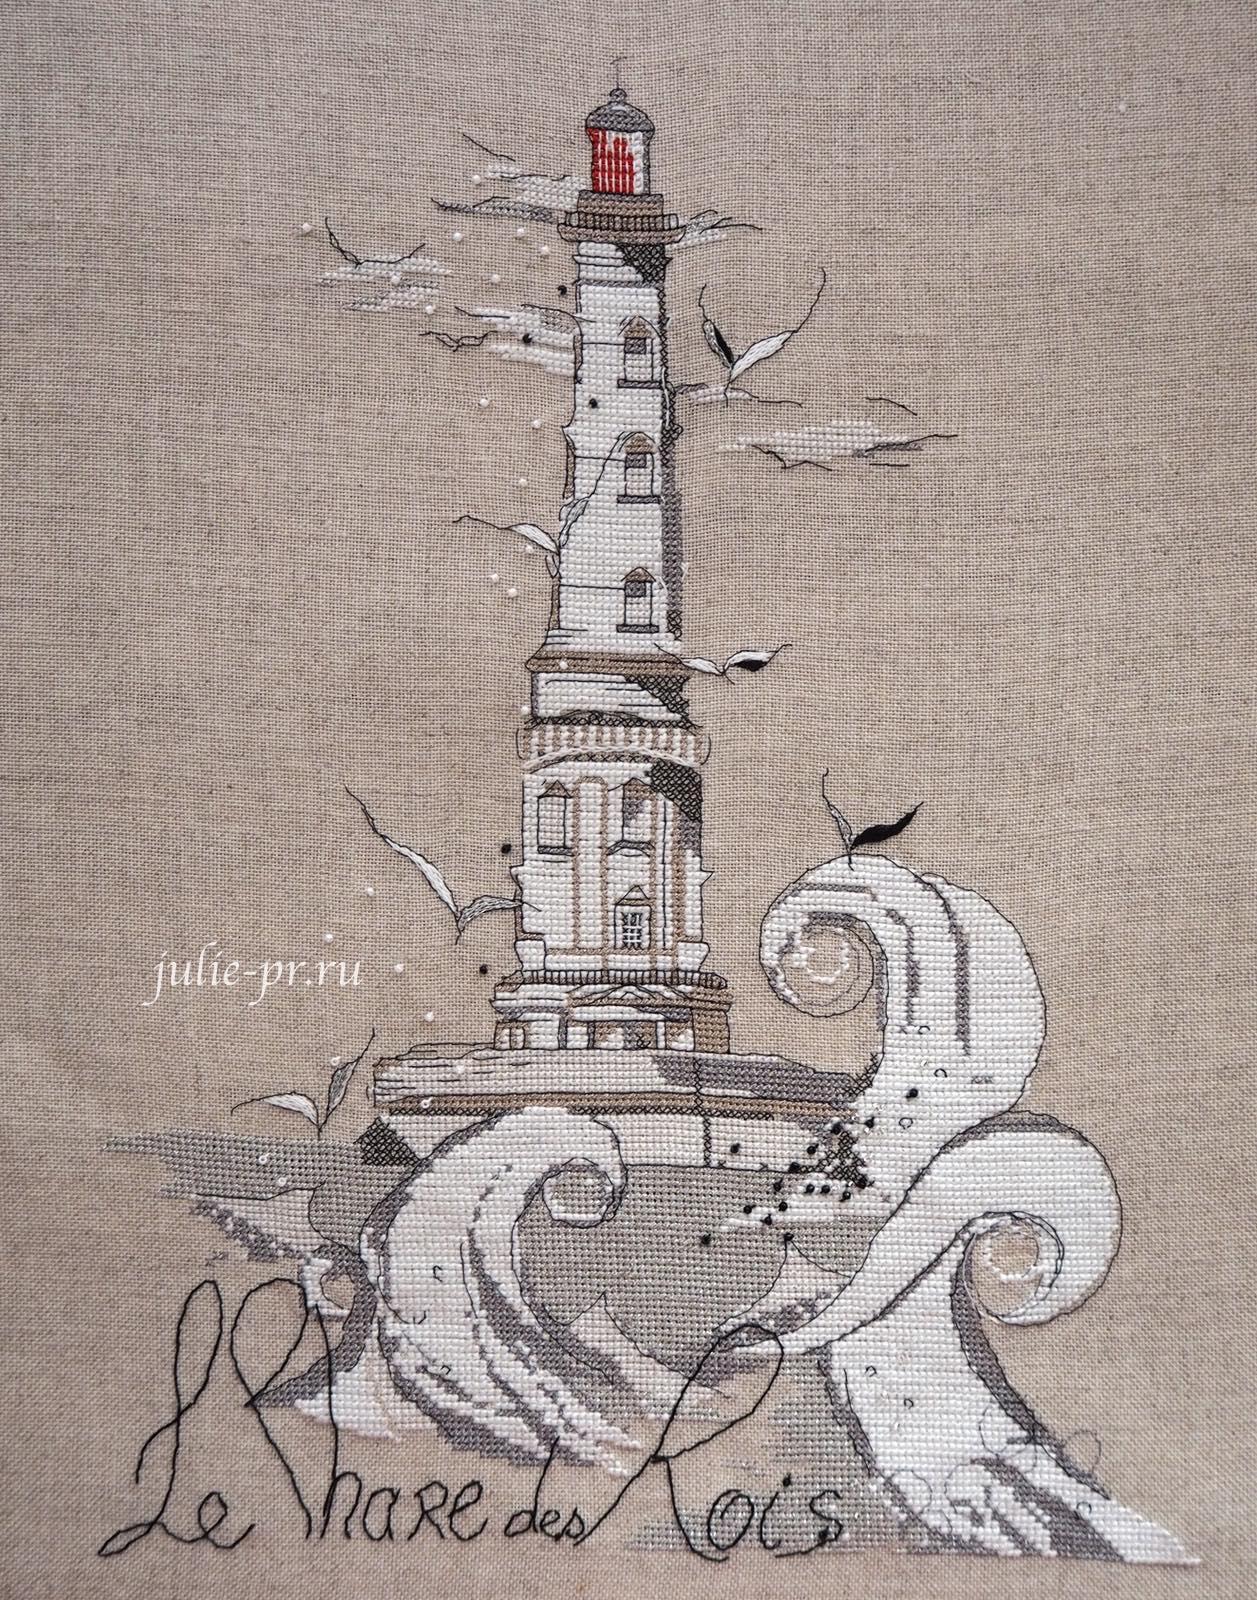 Soizic, Le Phare des Rois, Кордуанский маяк, Phare de Cordouan, вышивка крестом, белый маяк